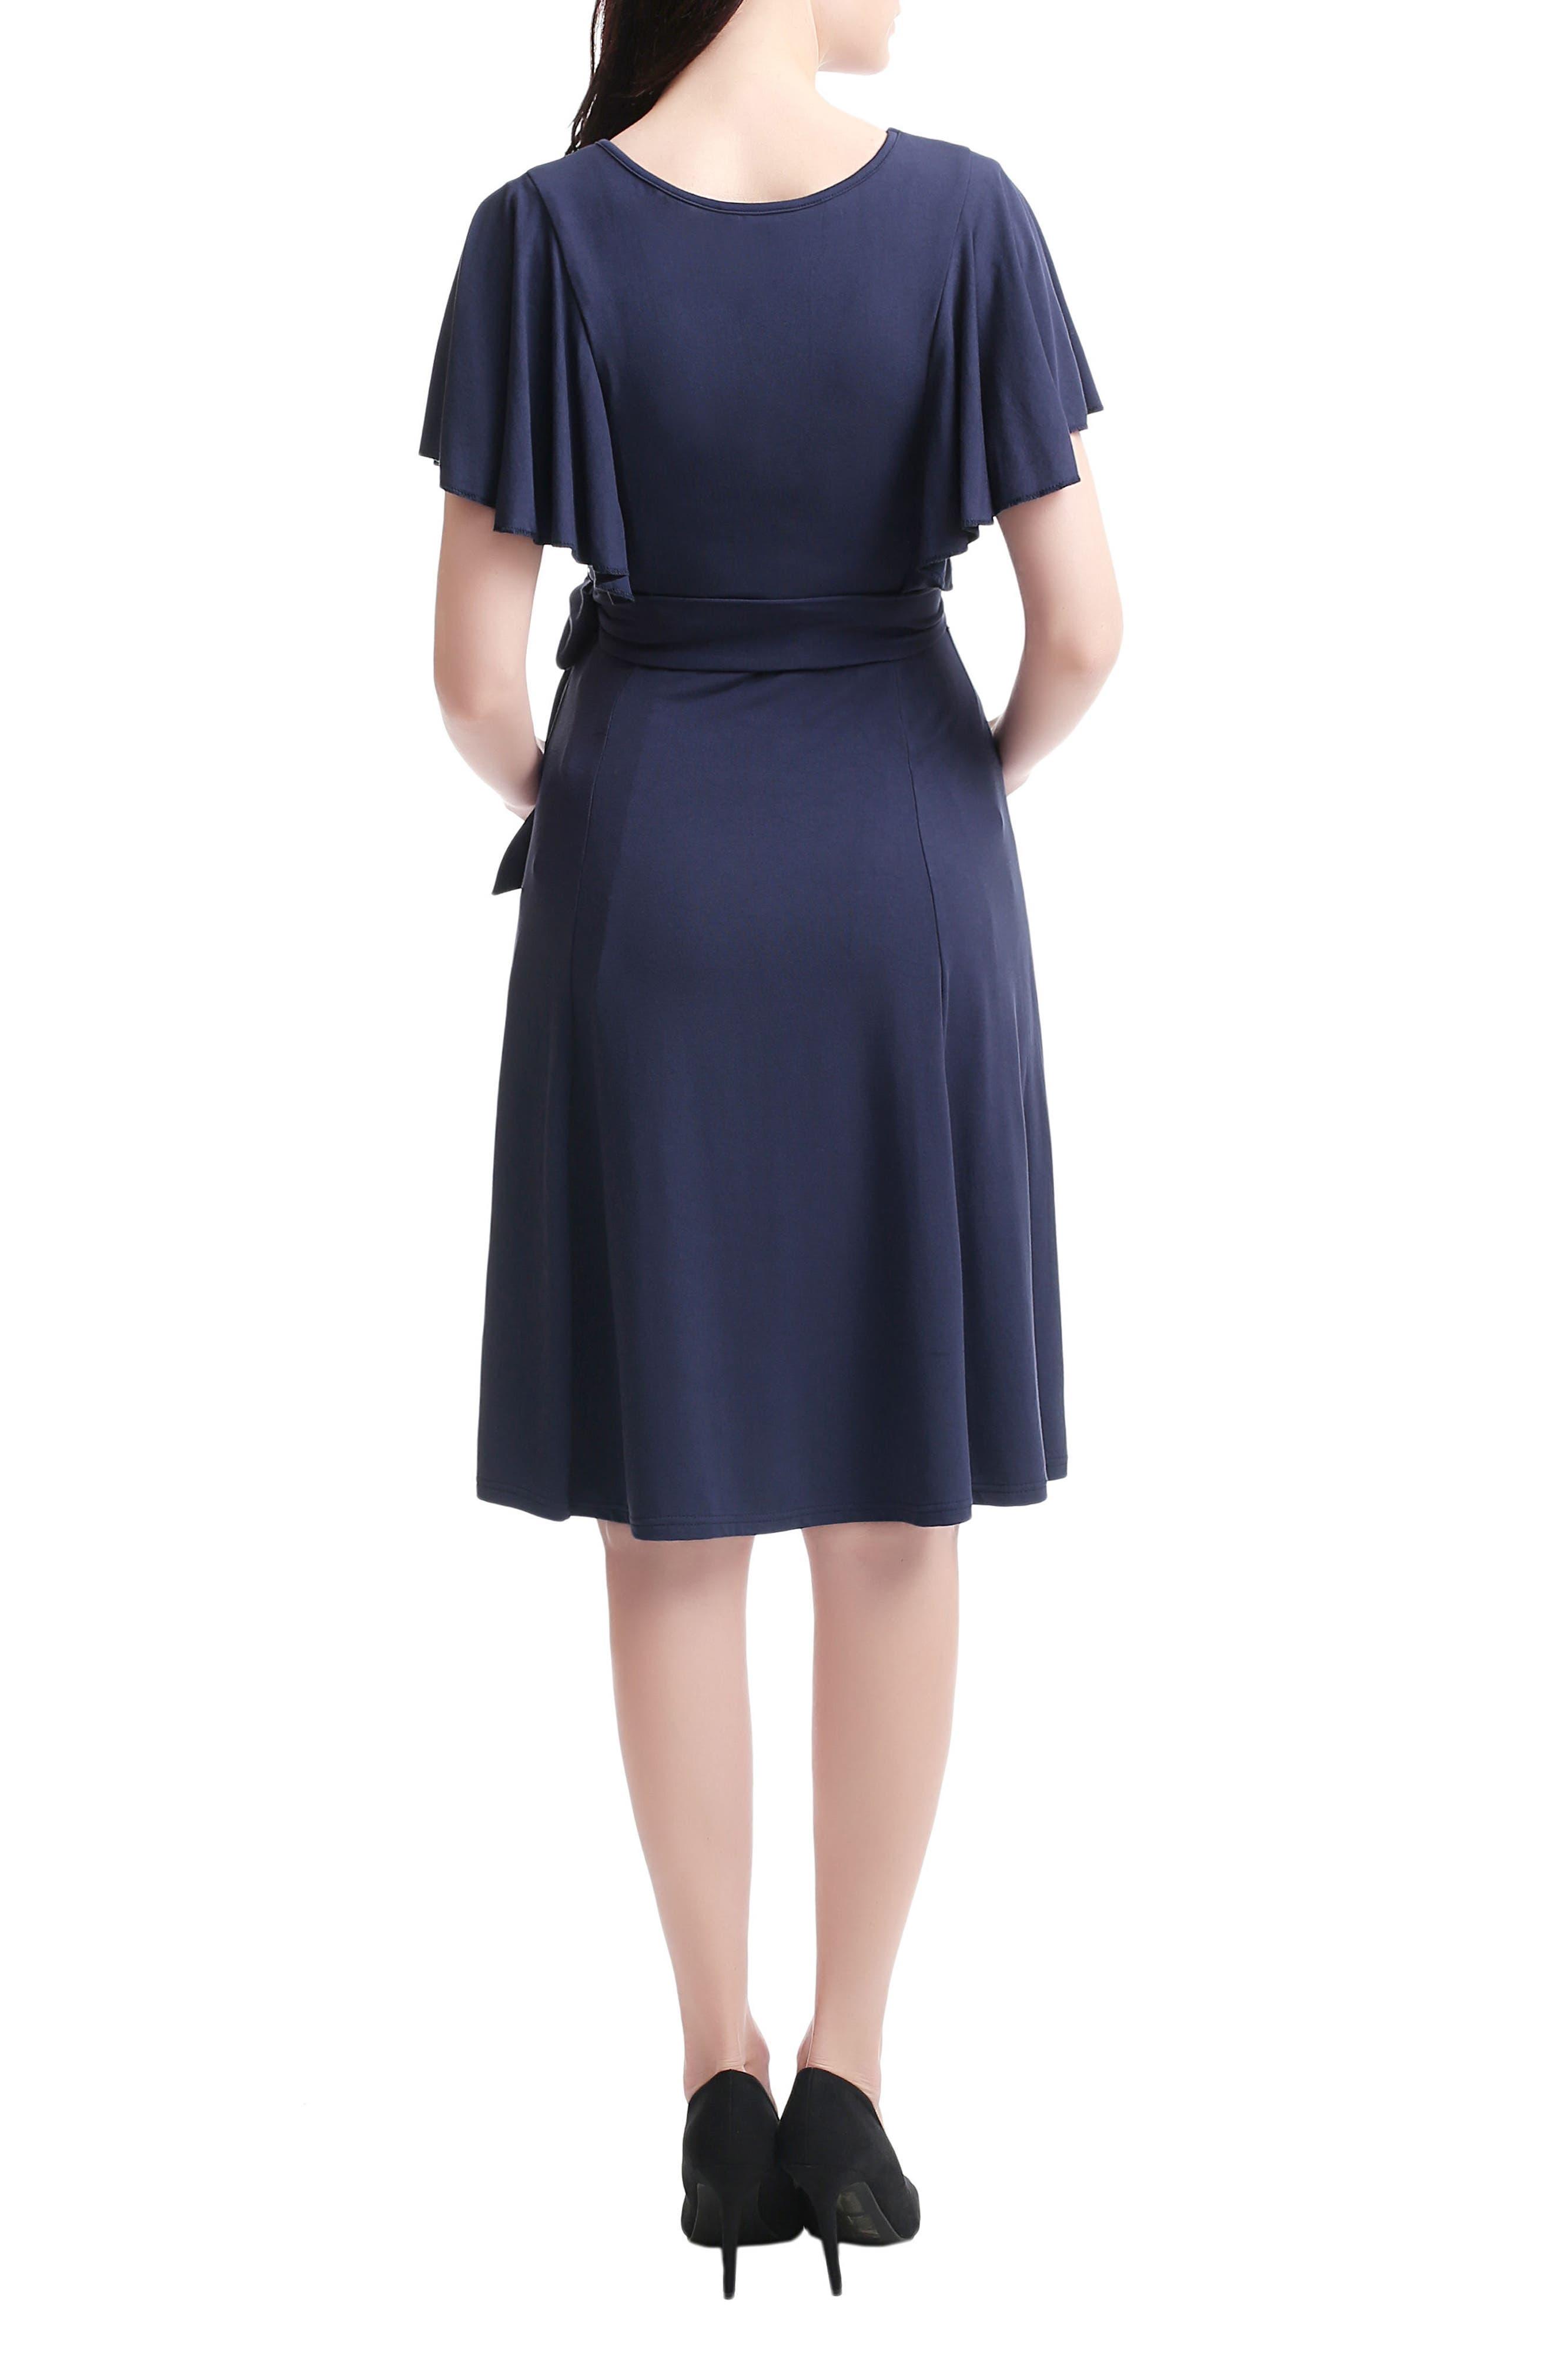 Kimi & Kai Rhea Tie Maternity/Nursing Skater Dress,                             Alternate thumbnail 2, color,                             NAVY